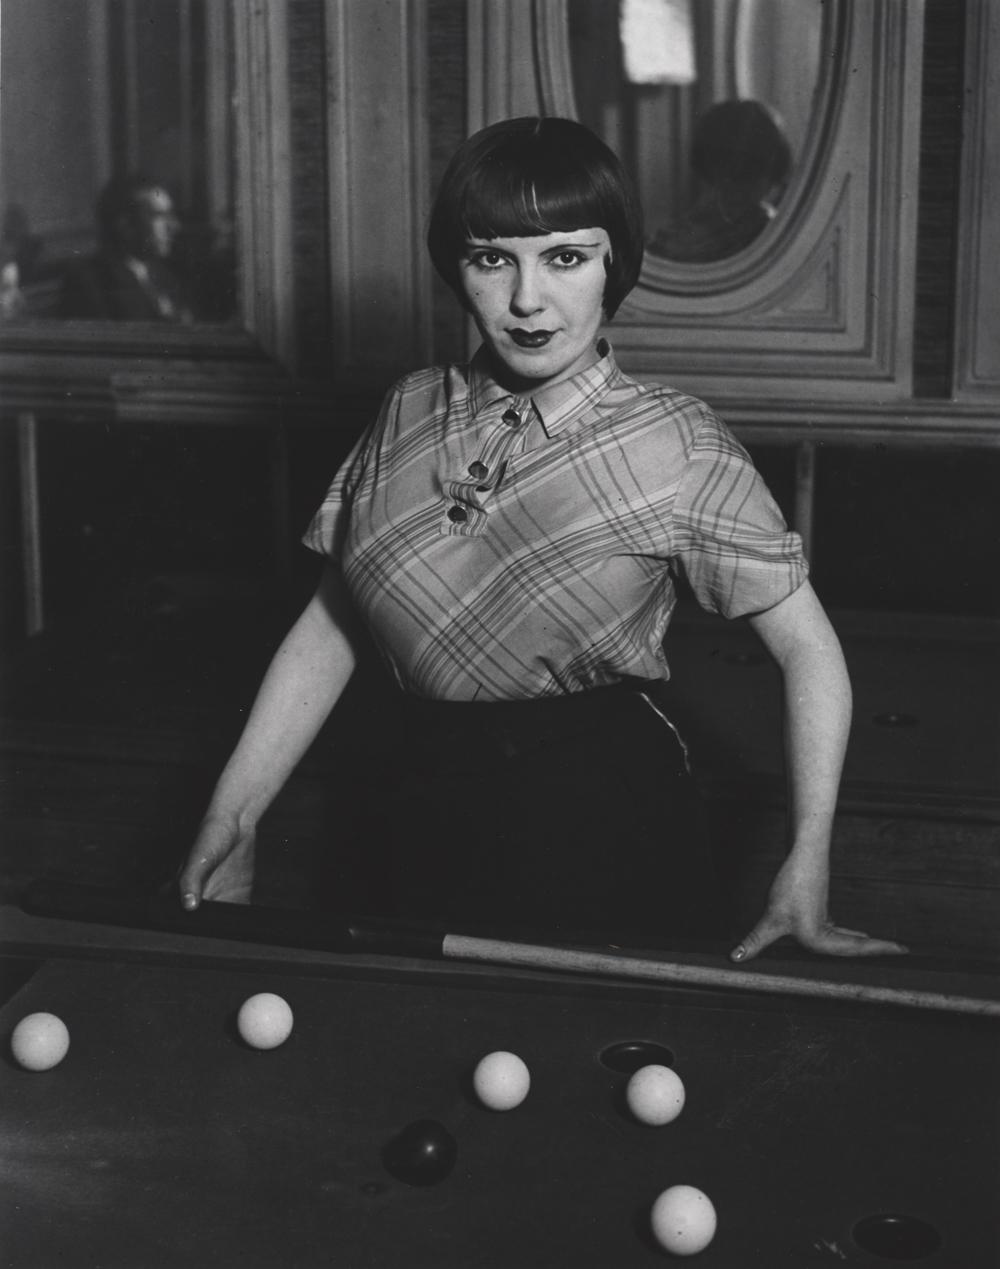 BRASSAI Girl Playing Russian Billiards, Montmartre, Paris,1933/1973